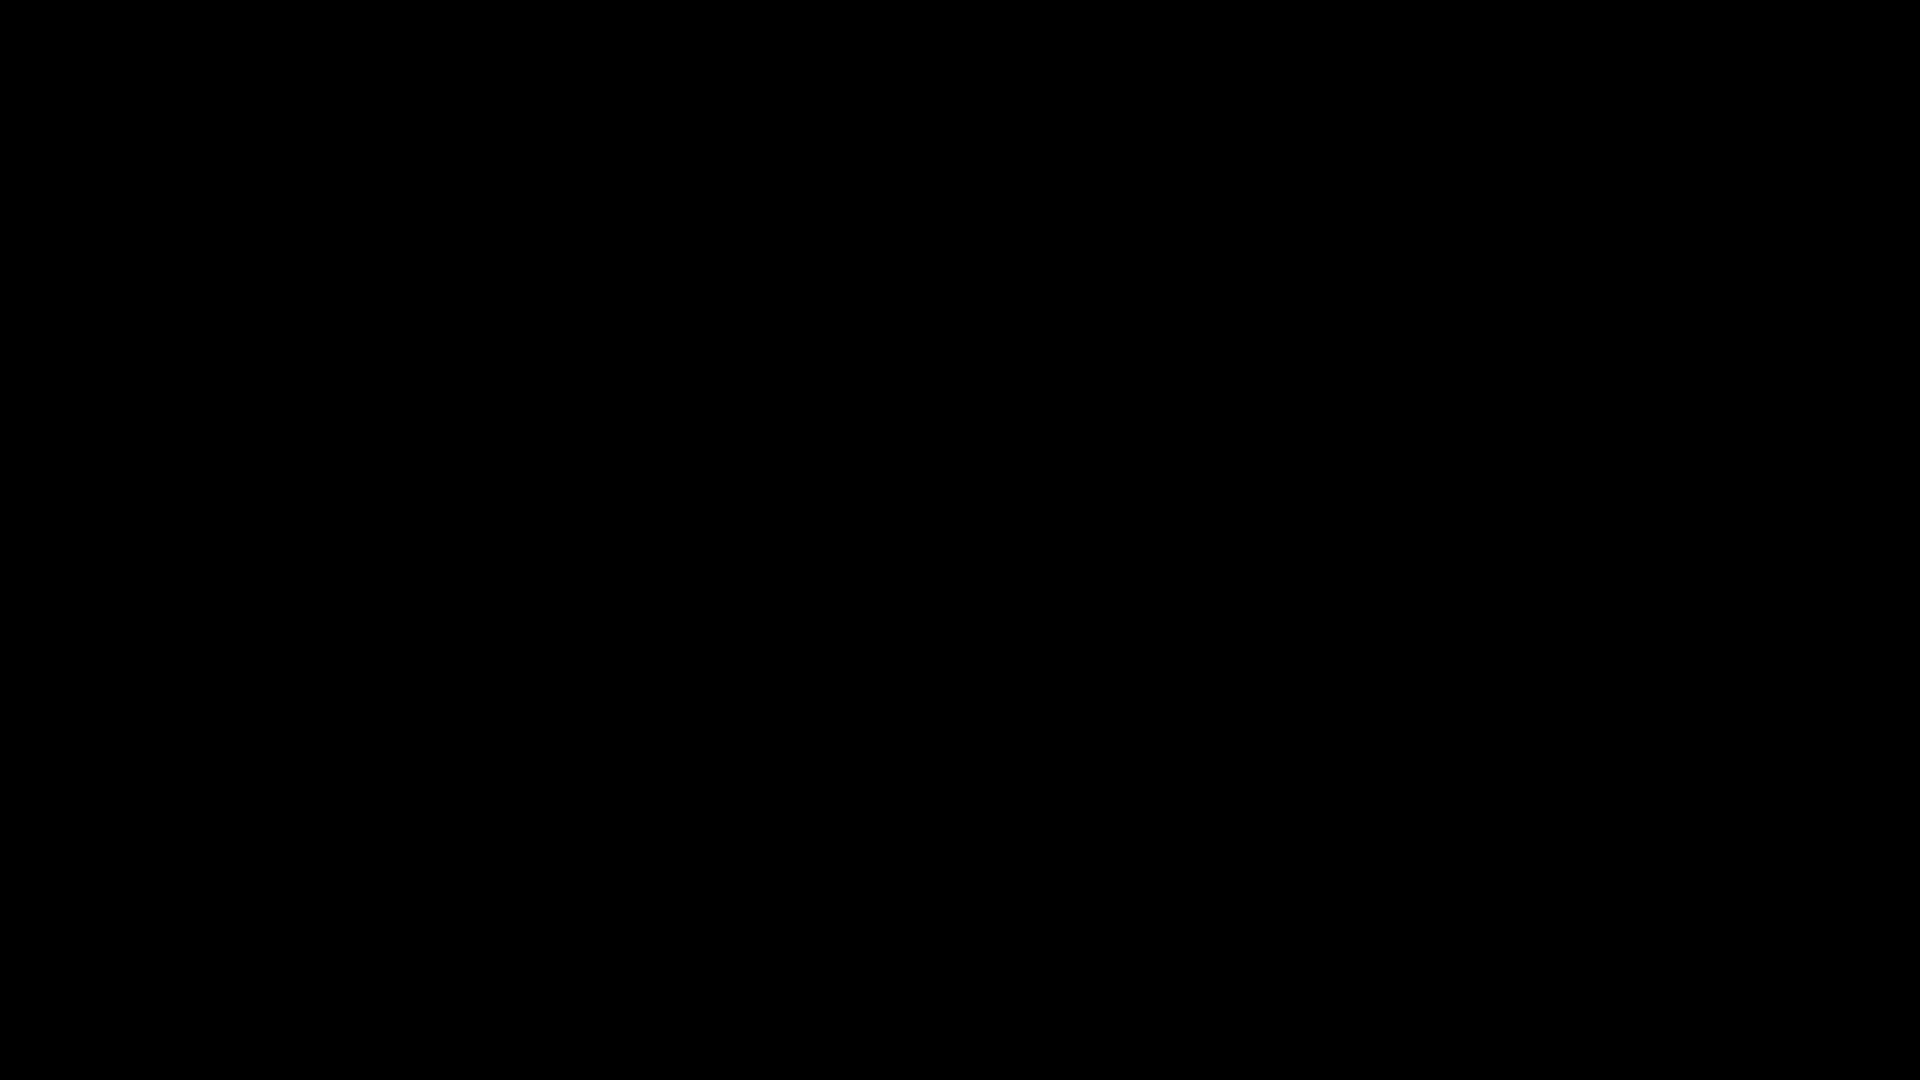 summonerswar, Kobold Bomber GIFs